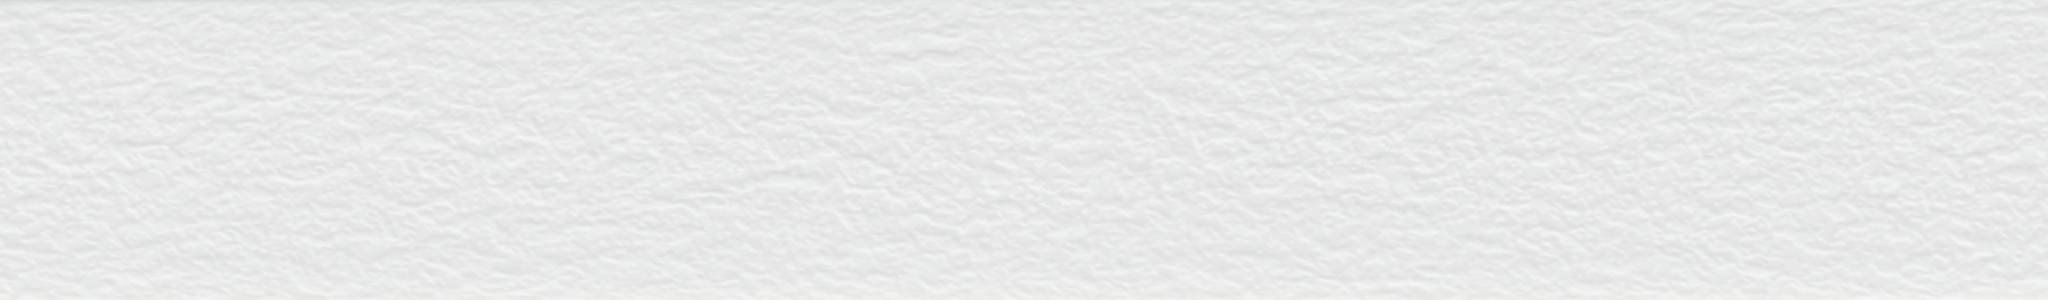 HU 17671 кромка ABS серая жемчуг XA